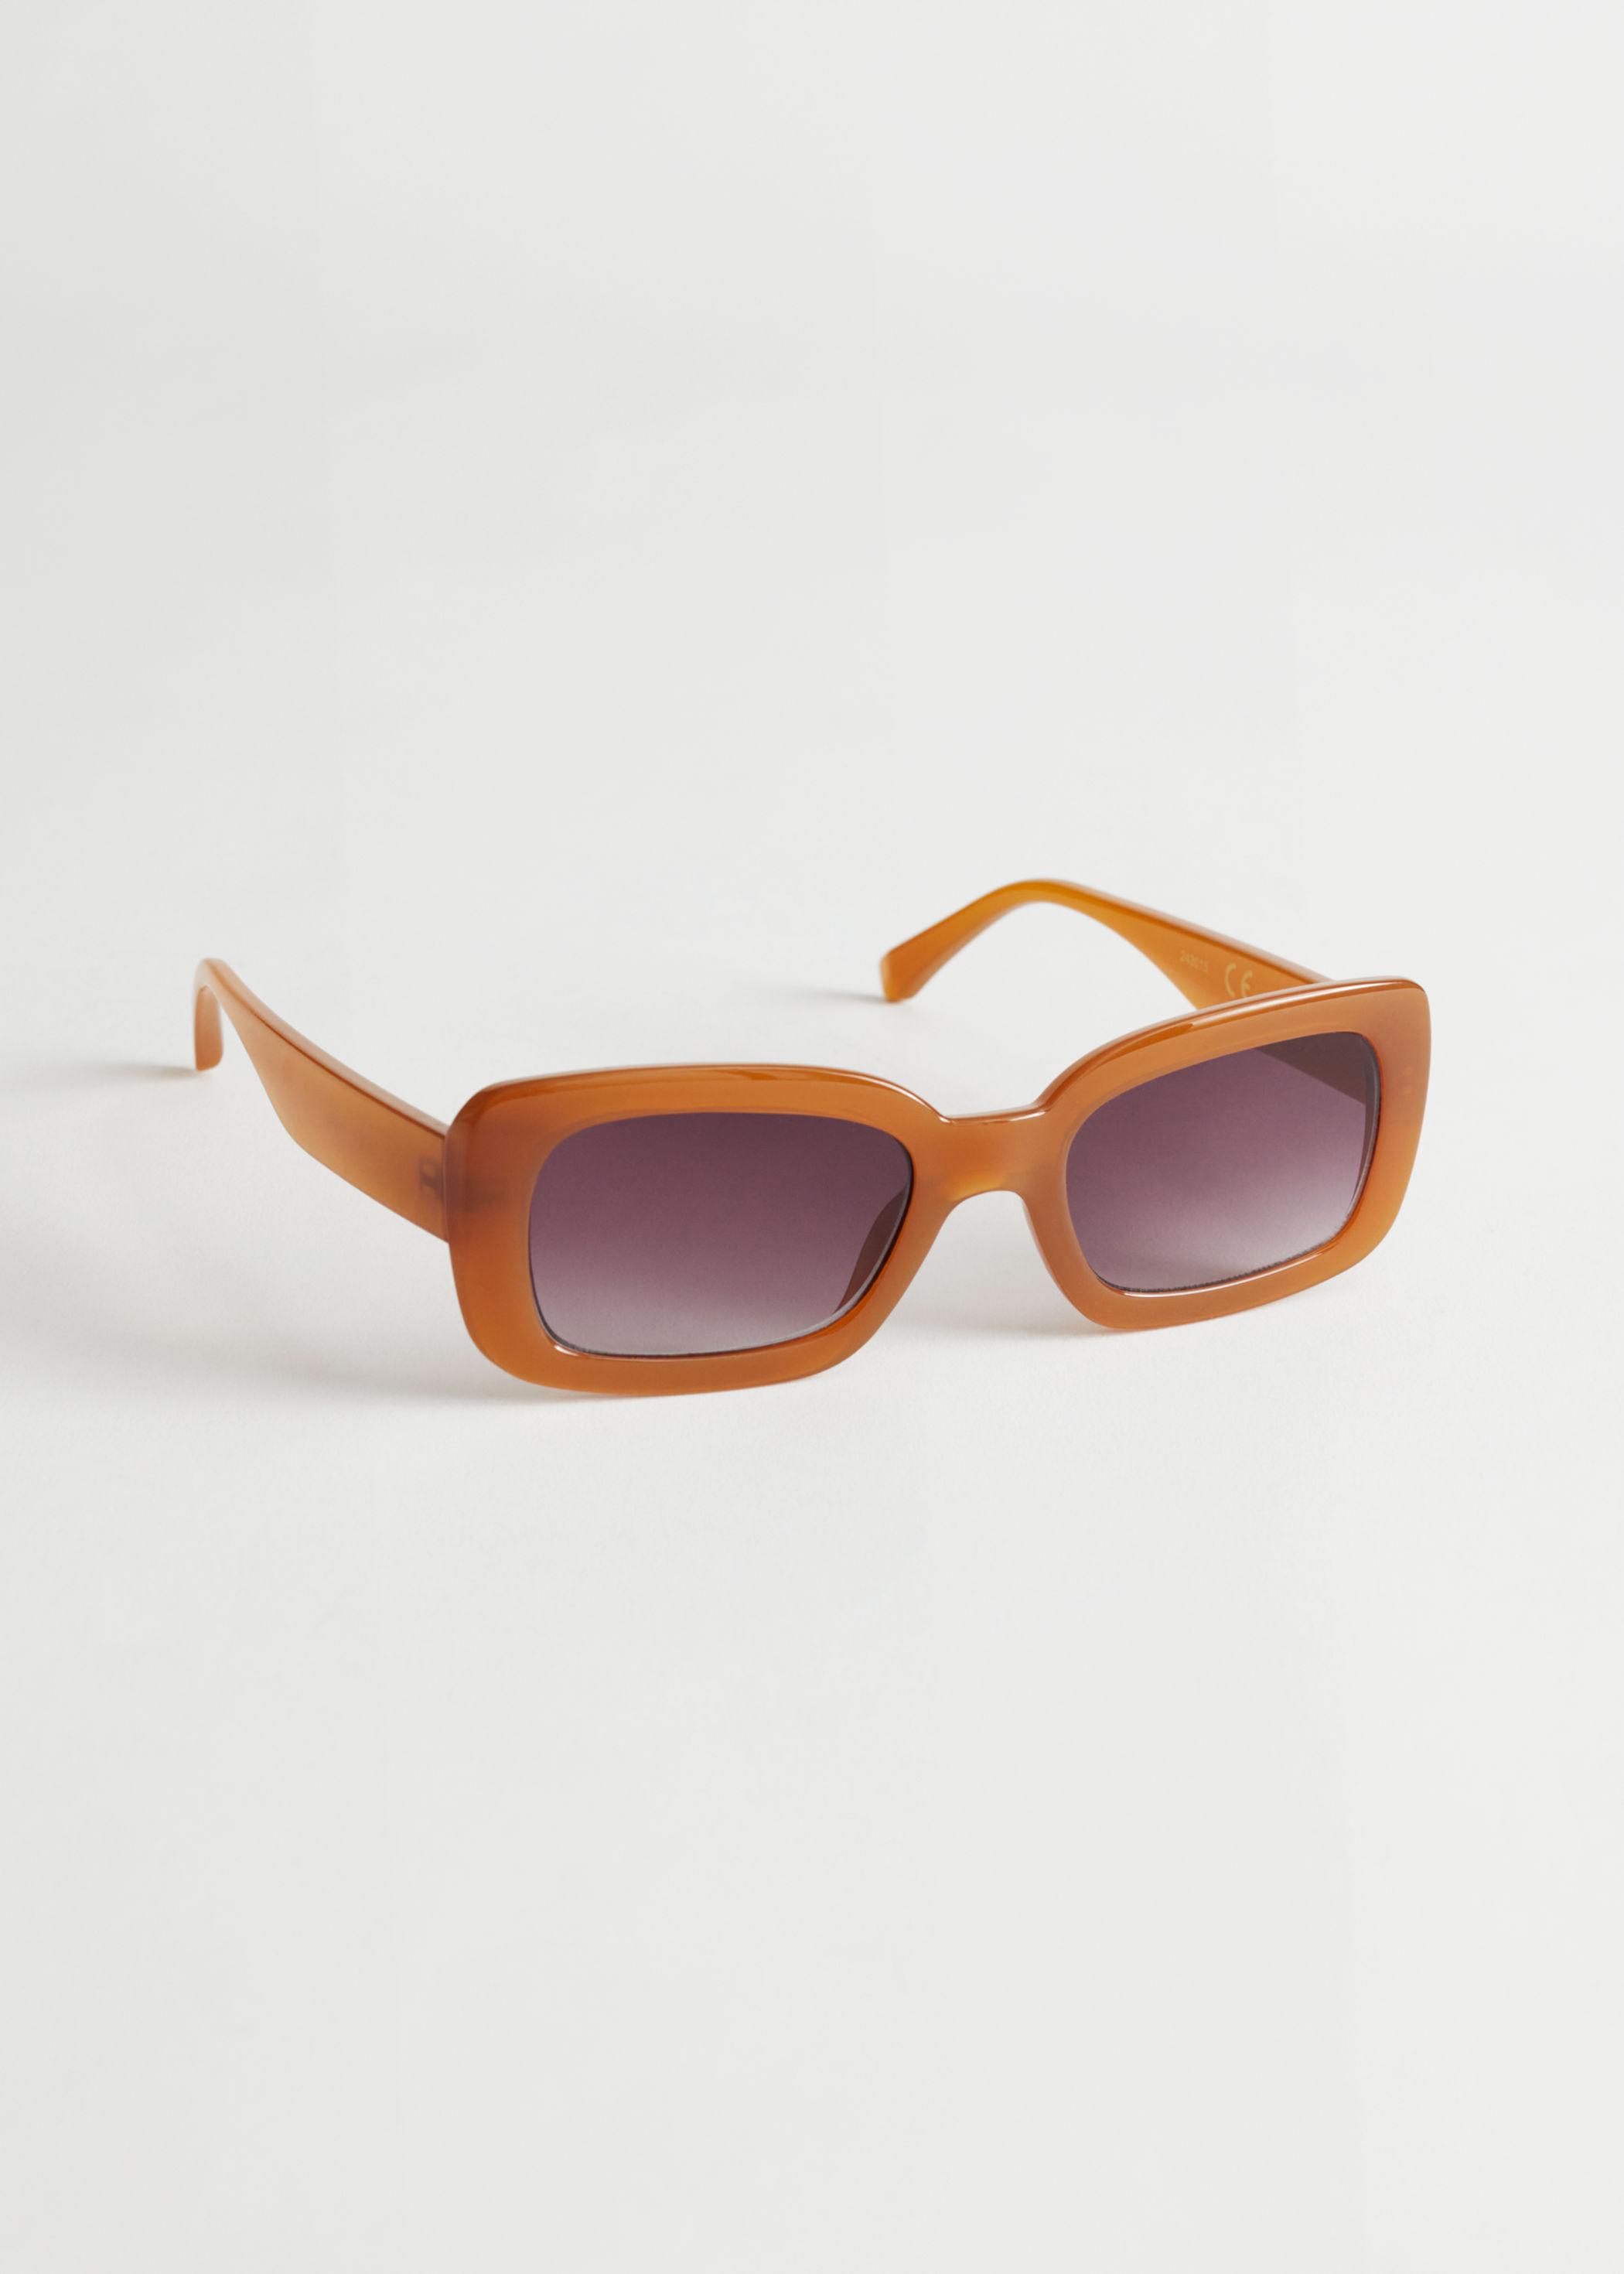 Rectangular Frame Sunglasses, £27, & Other Stories